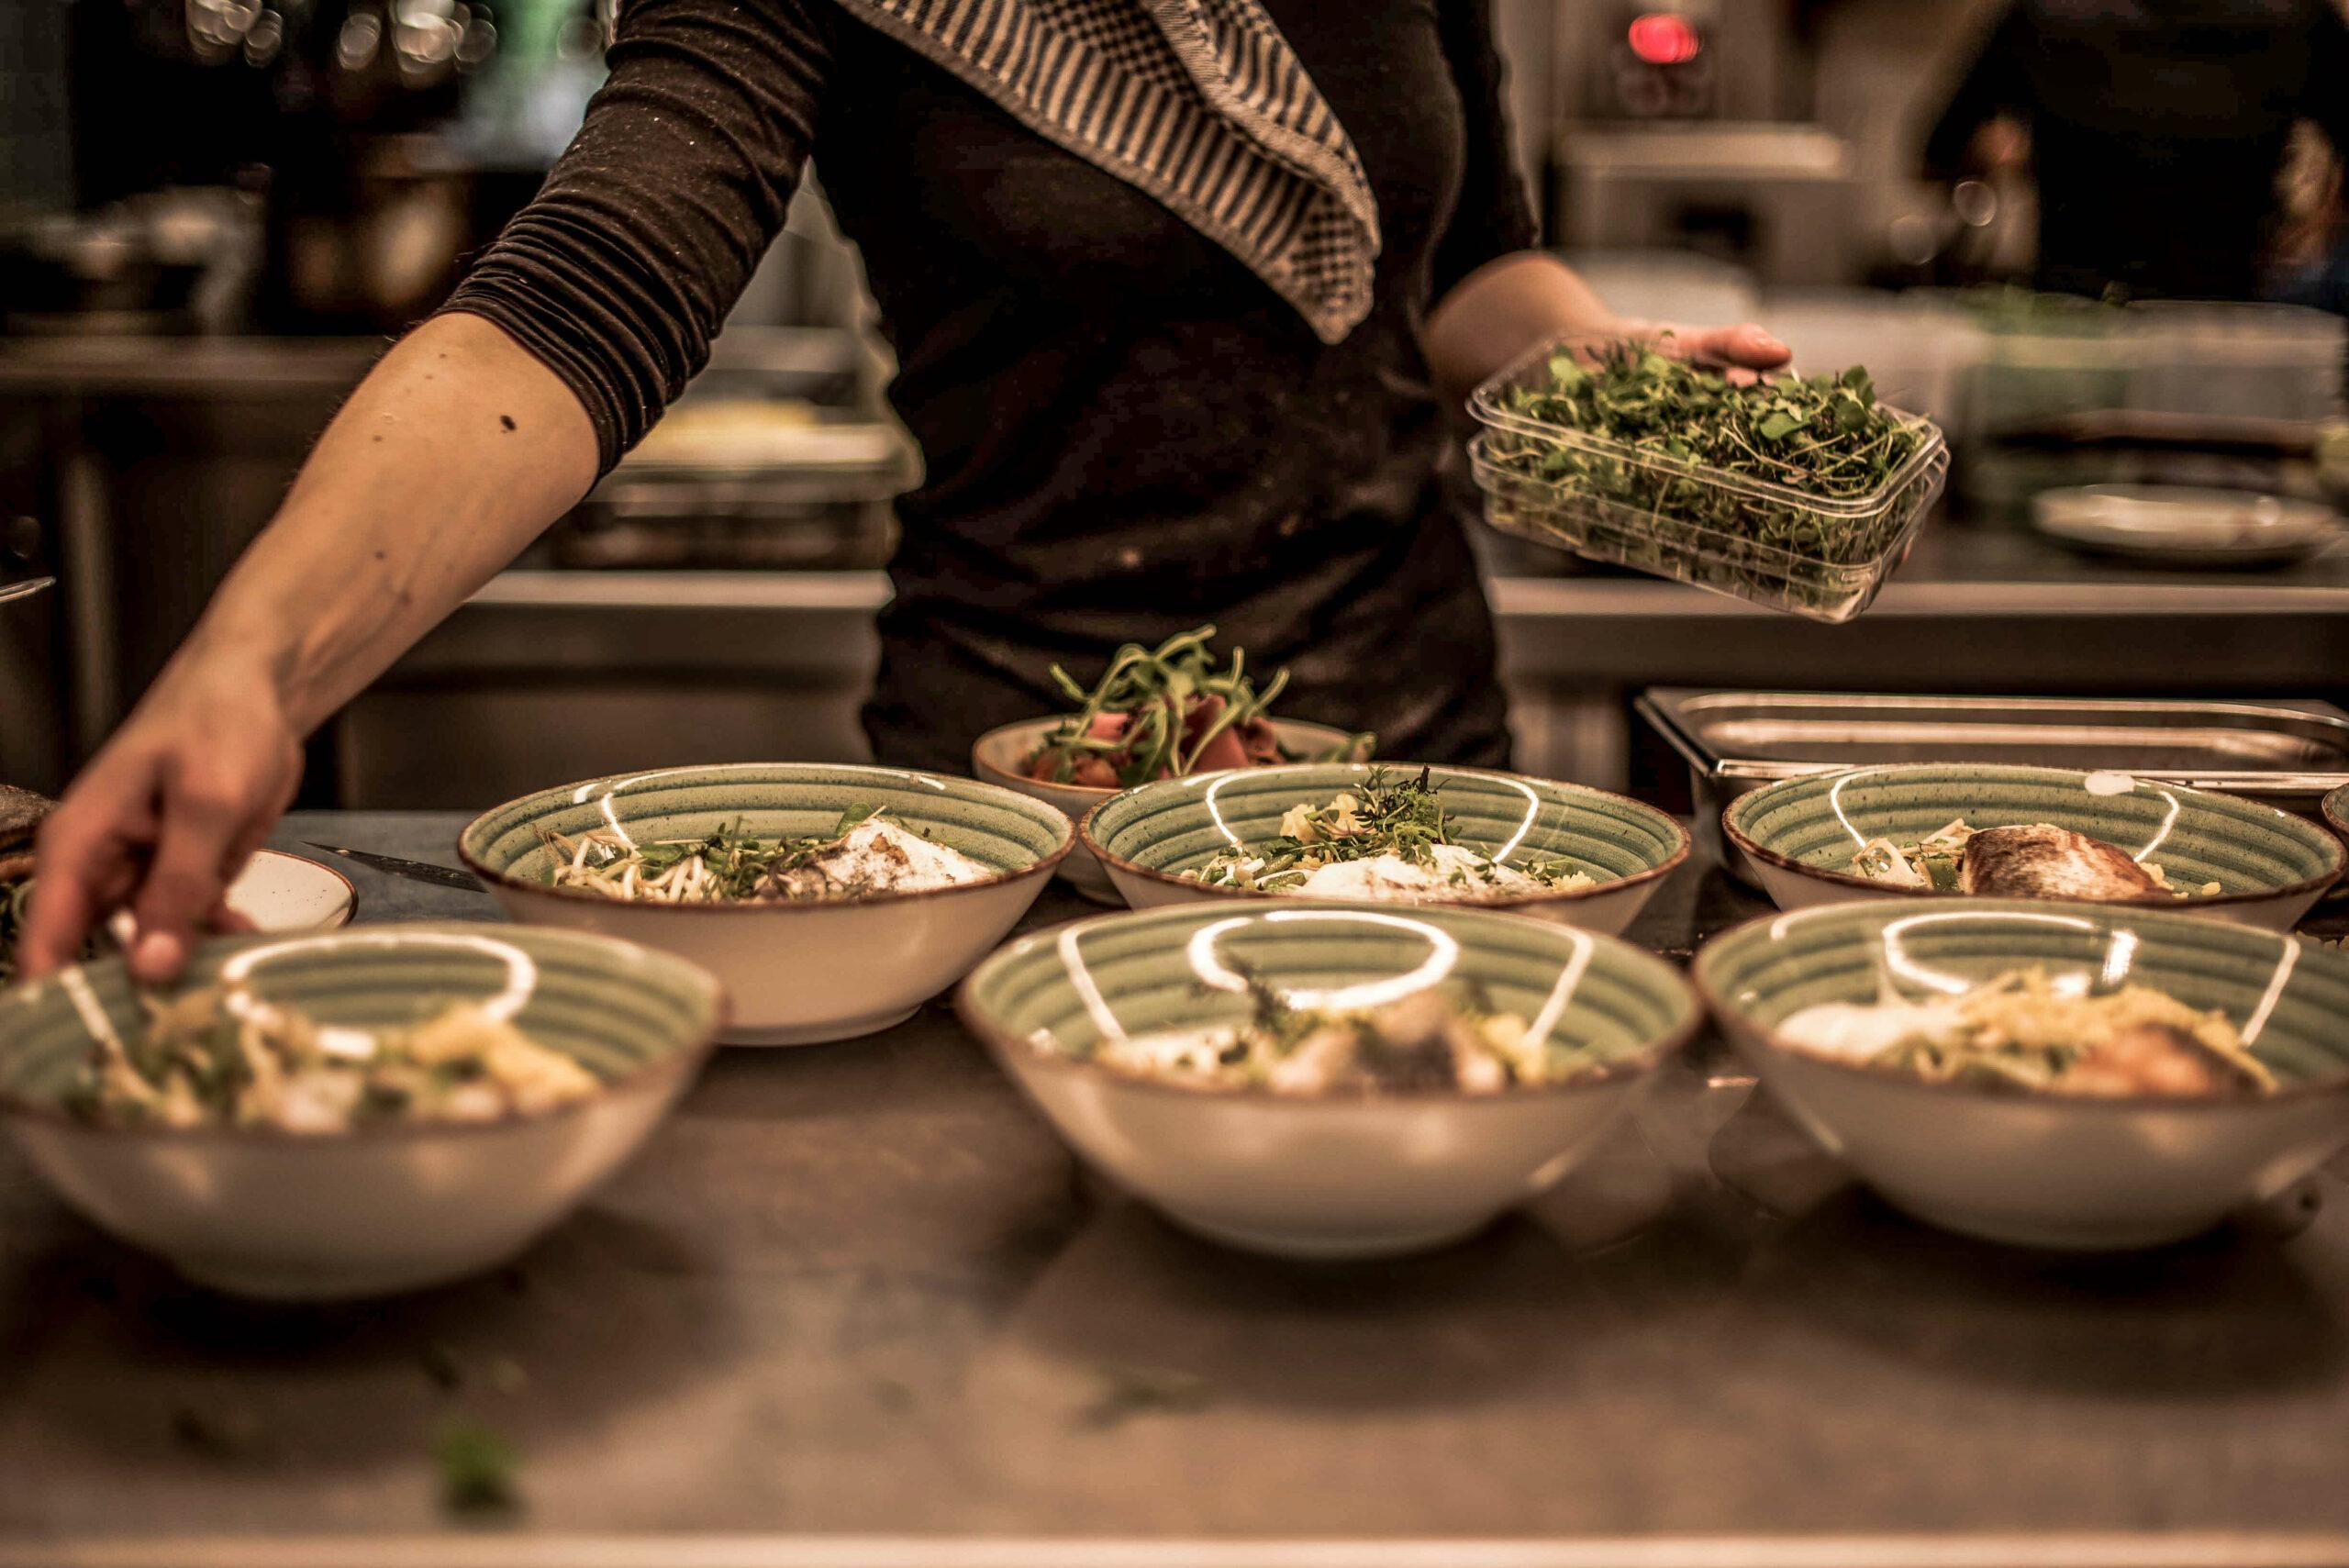 How to improve Restaurant Branding